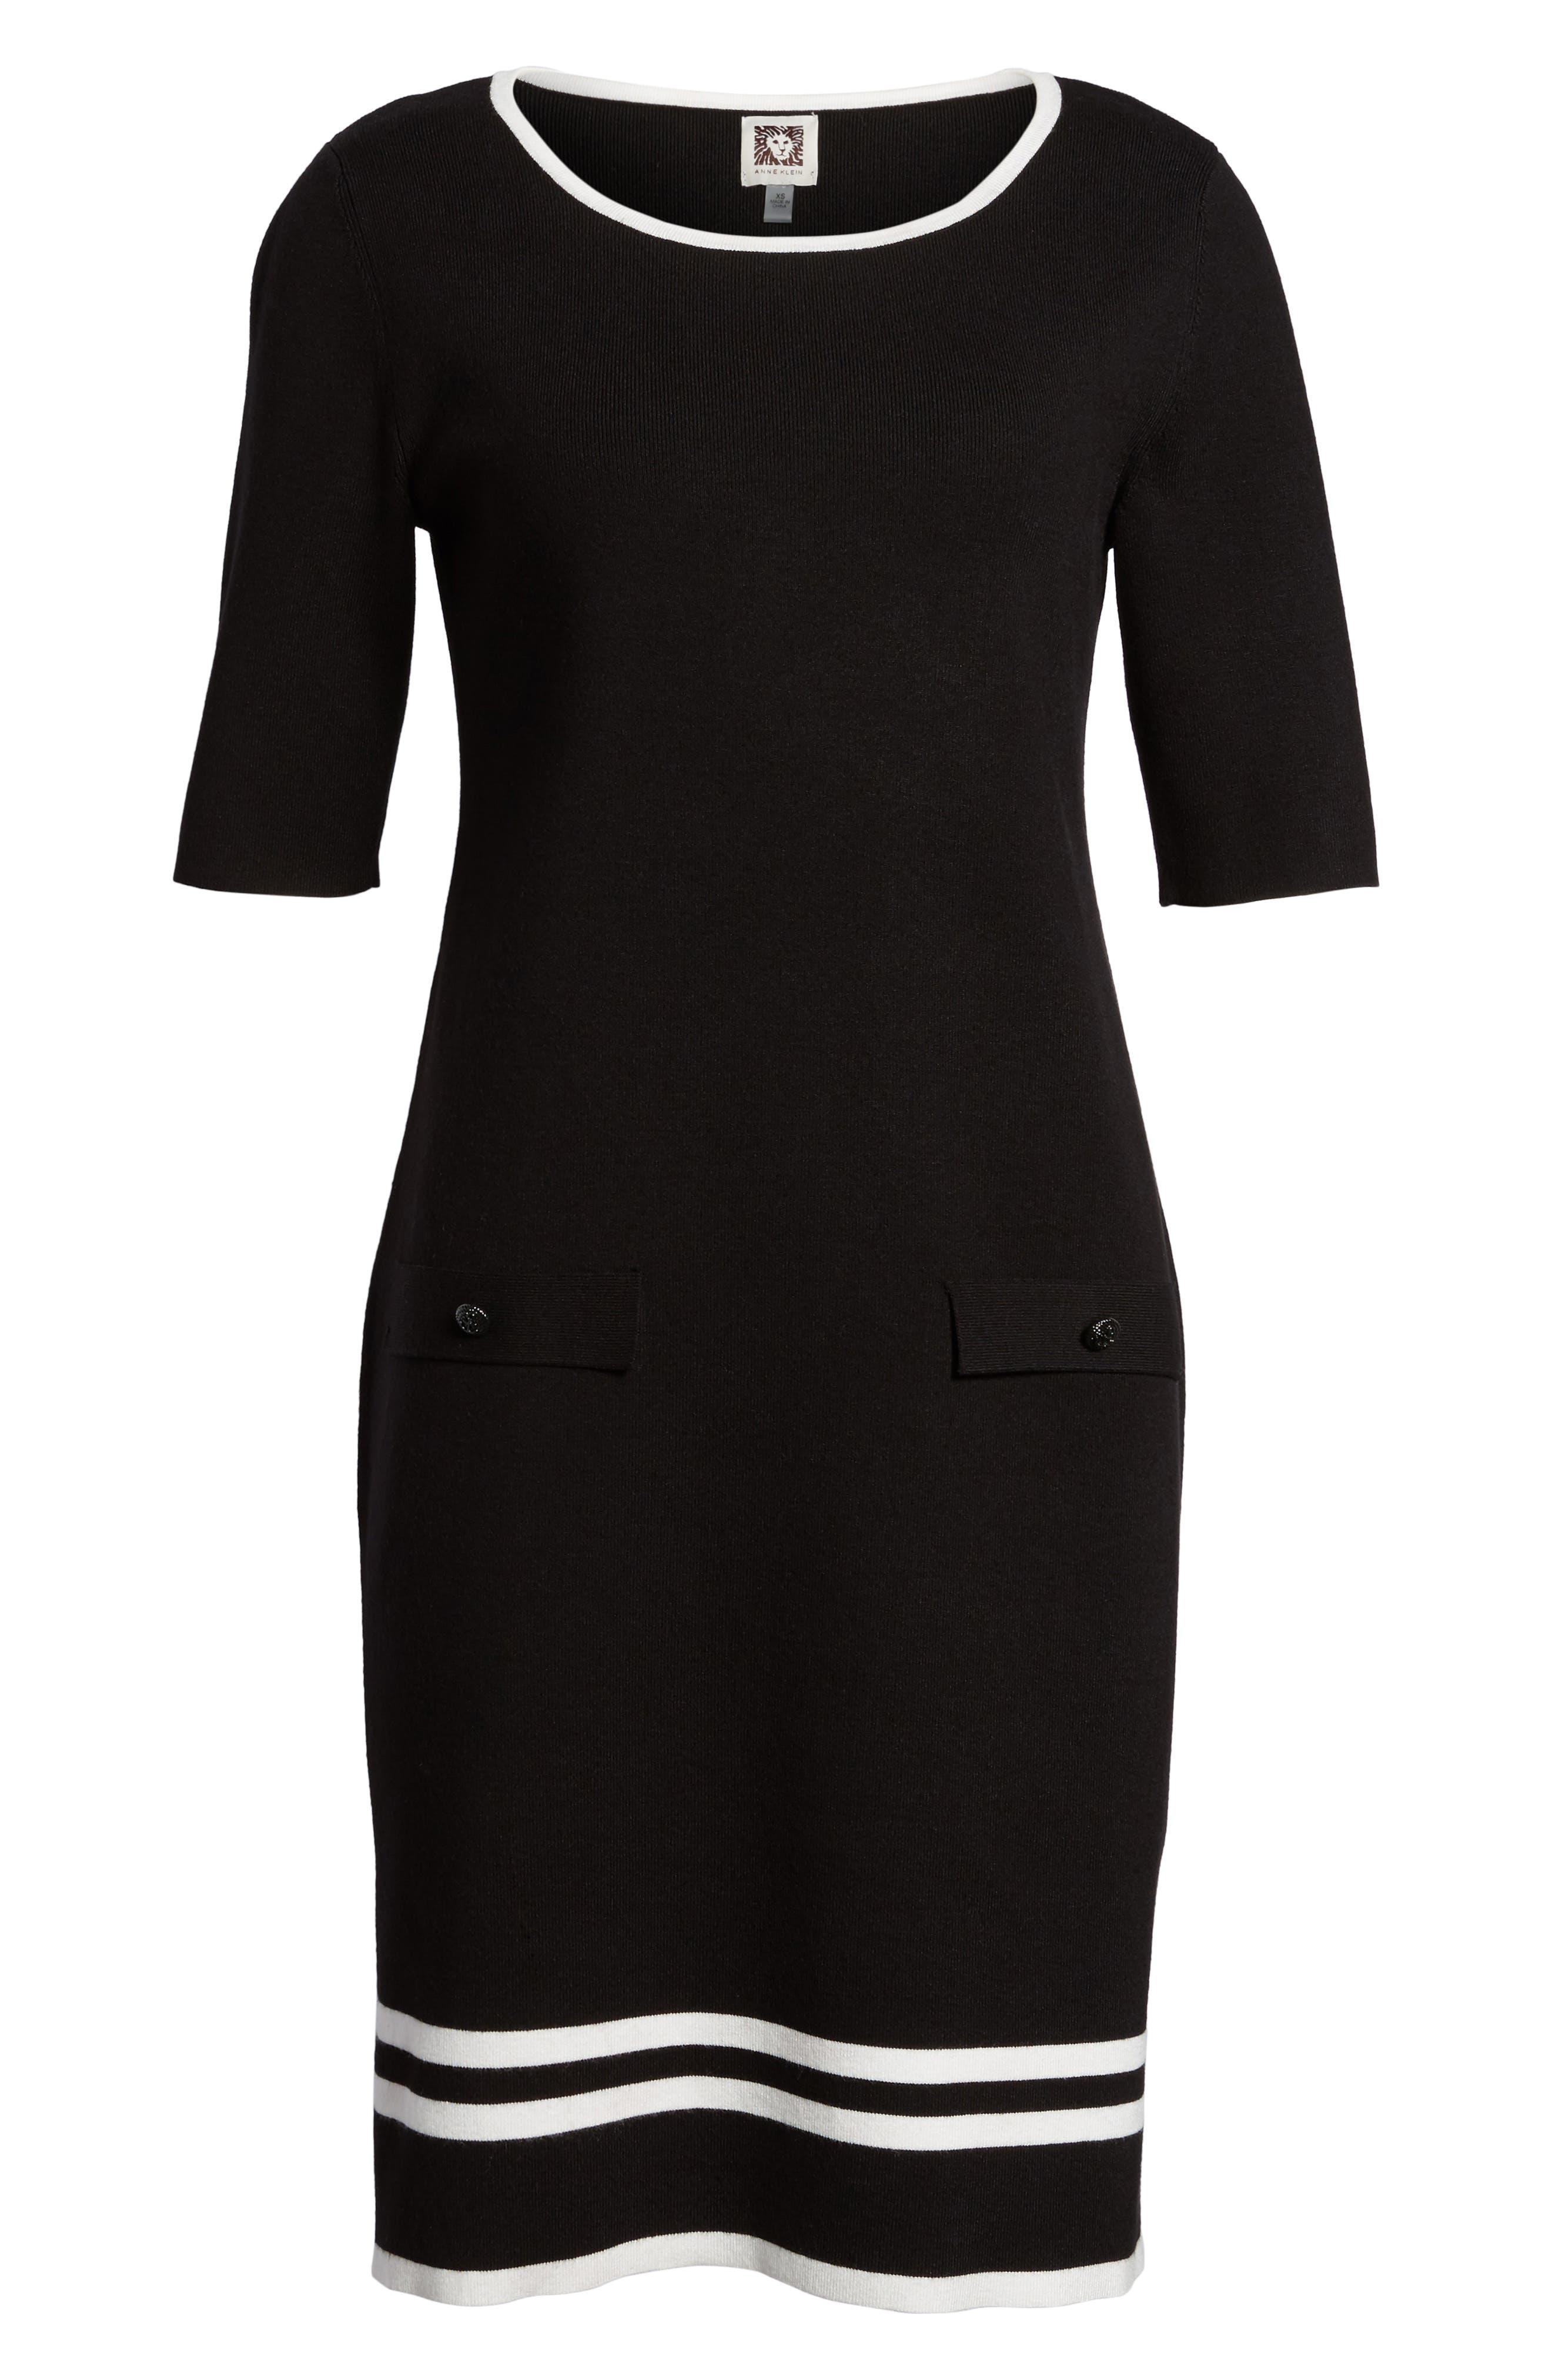 Ann Klein New York Stripe Border Knit Sheath Dress,                             Alternate thumbnail 7, color,                             Black/ White